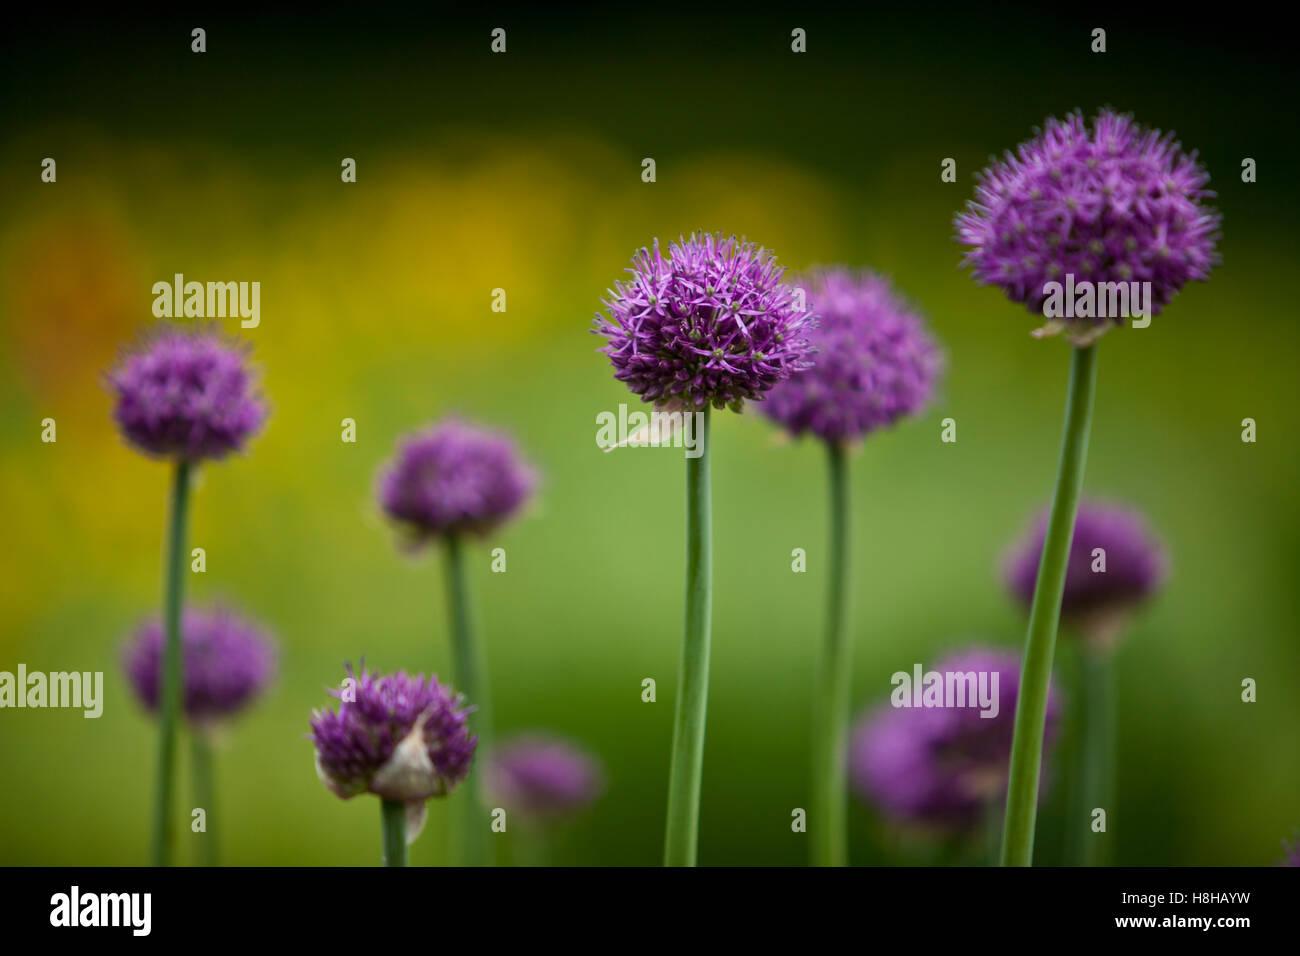 Onions flowers Stock Photo